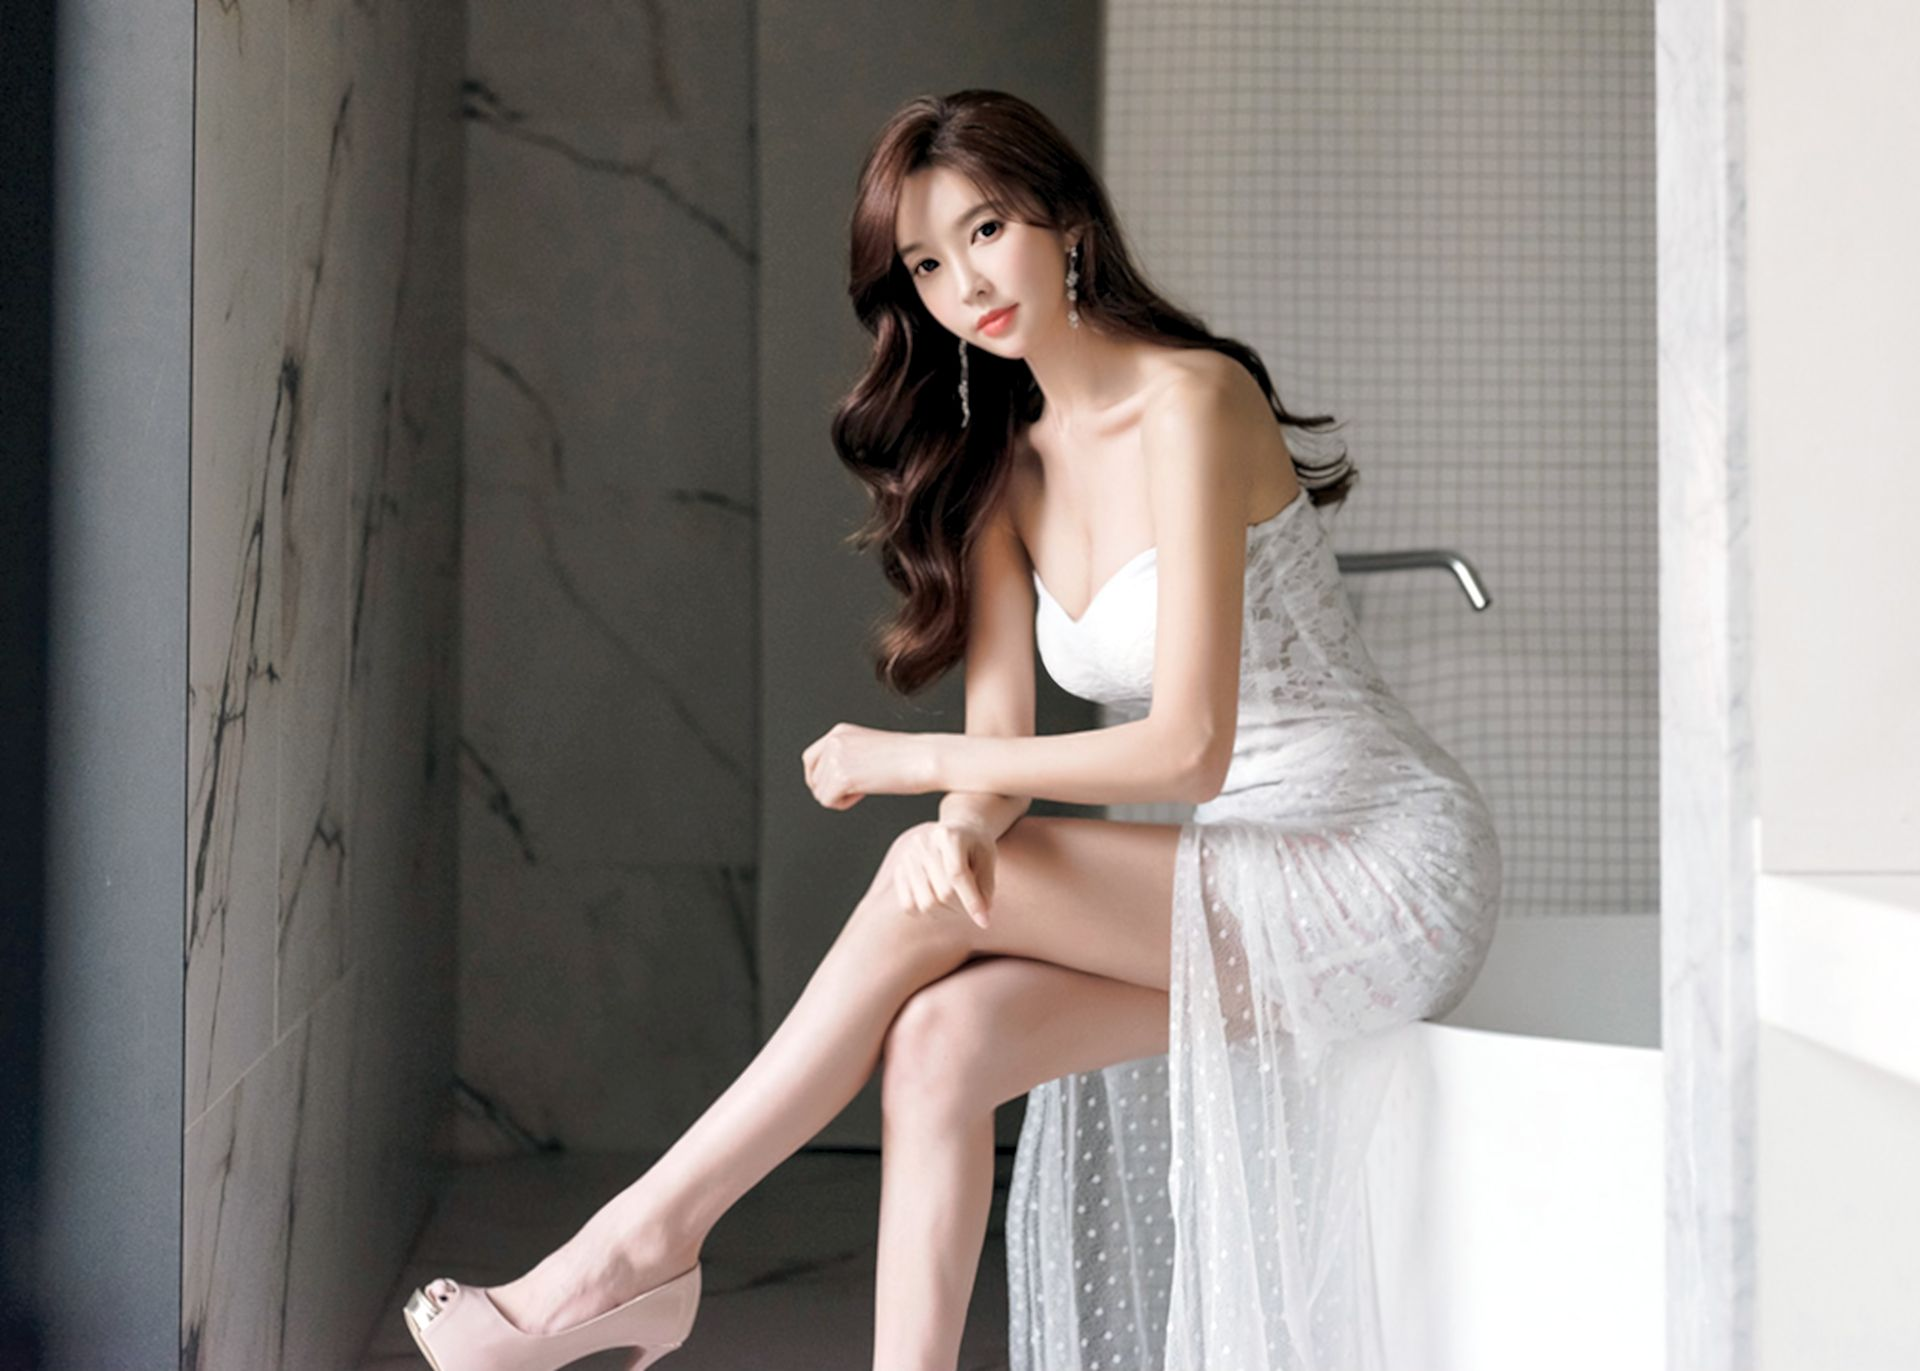 soumy1902kmod: 박수연 (朴秀妍 - ParkSooYeon) 코코엠 16at931 (1/2) | Fashion